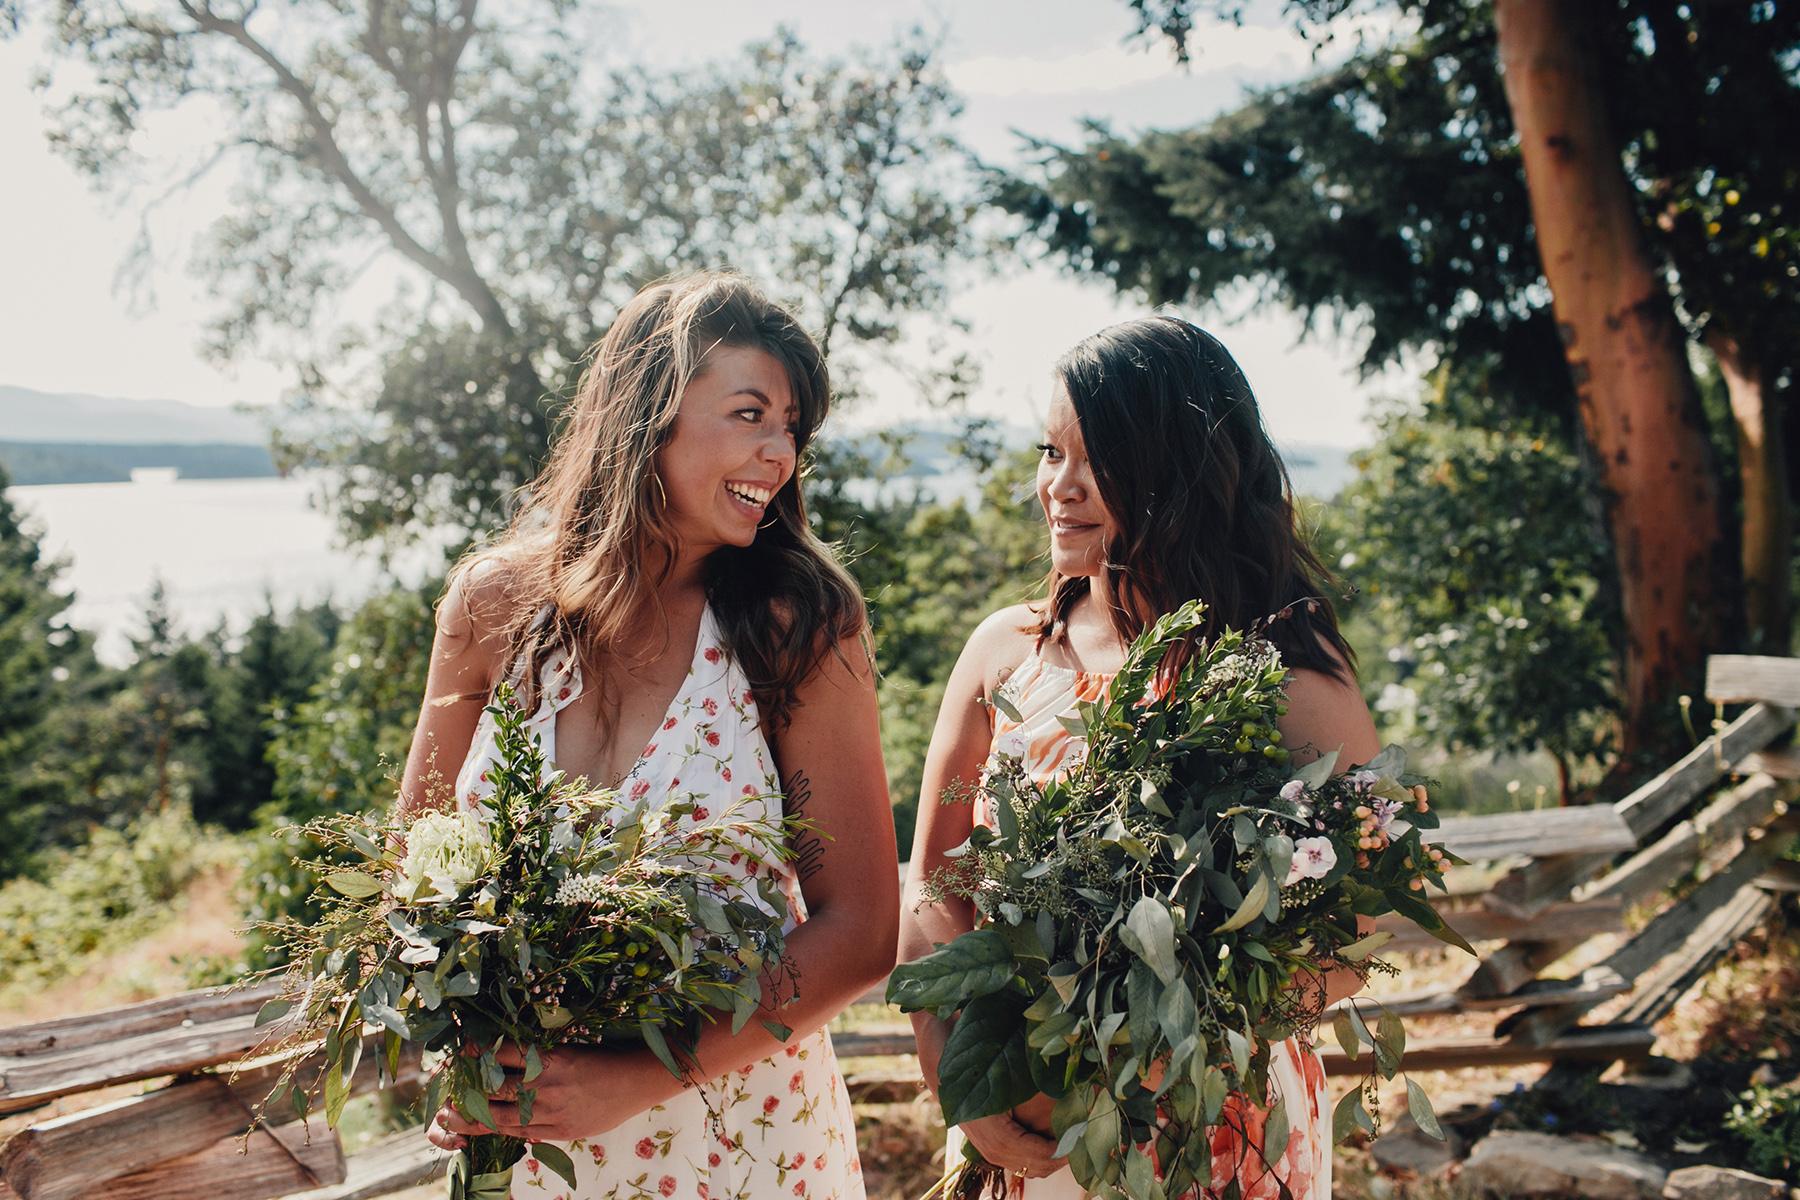 bodega-ridge-wedding-photos-0078.jpg